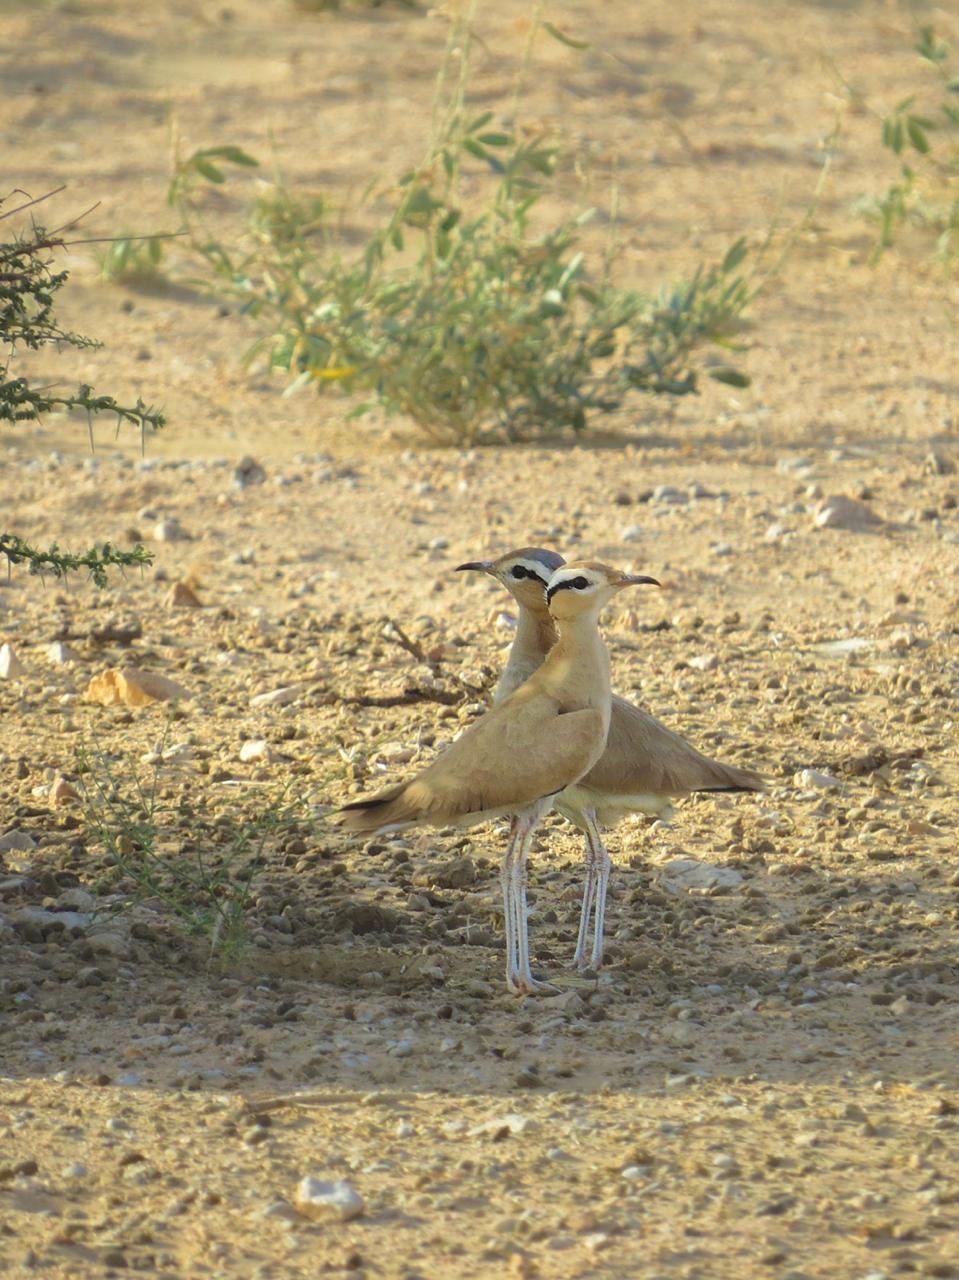 Migrating bird returns to Wildlife Reserve